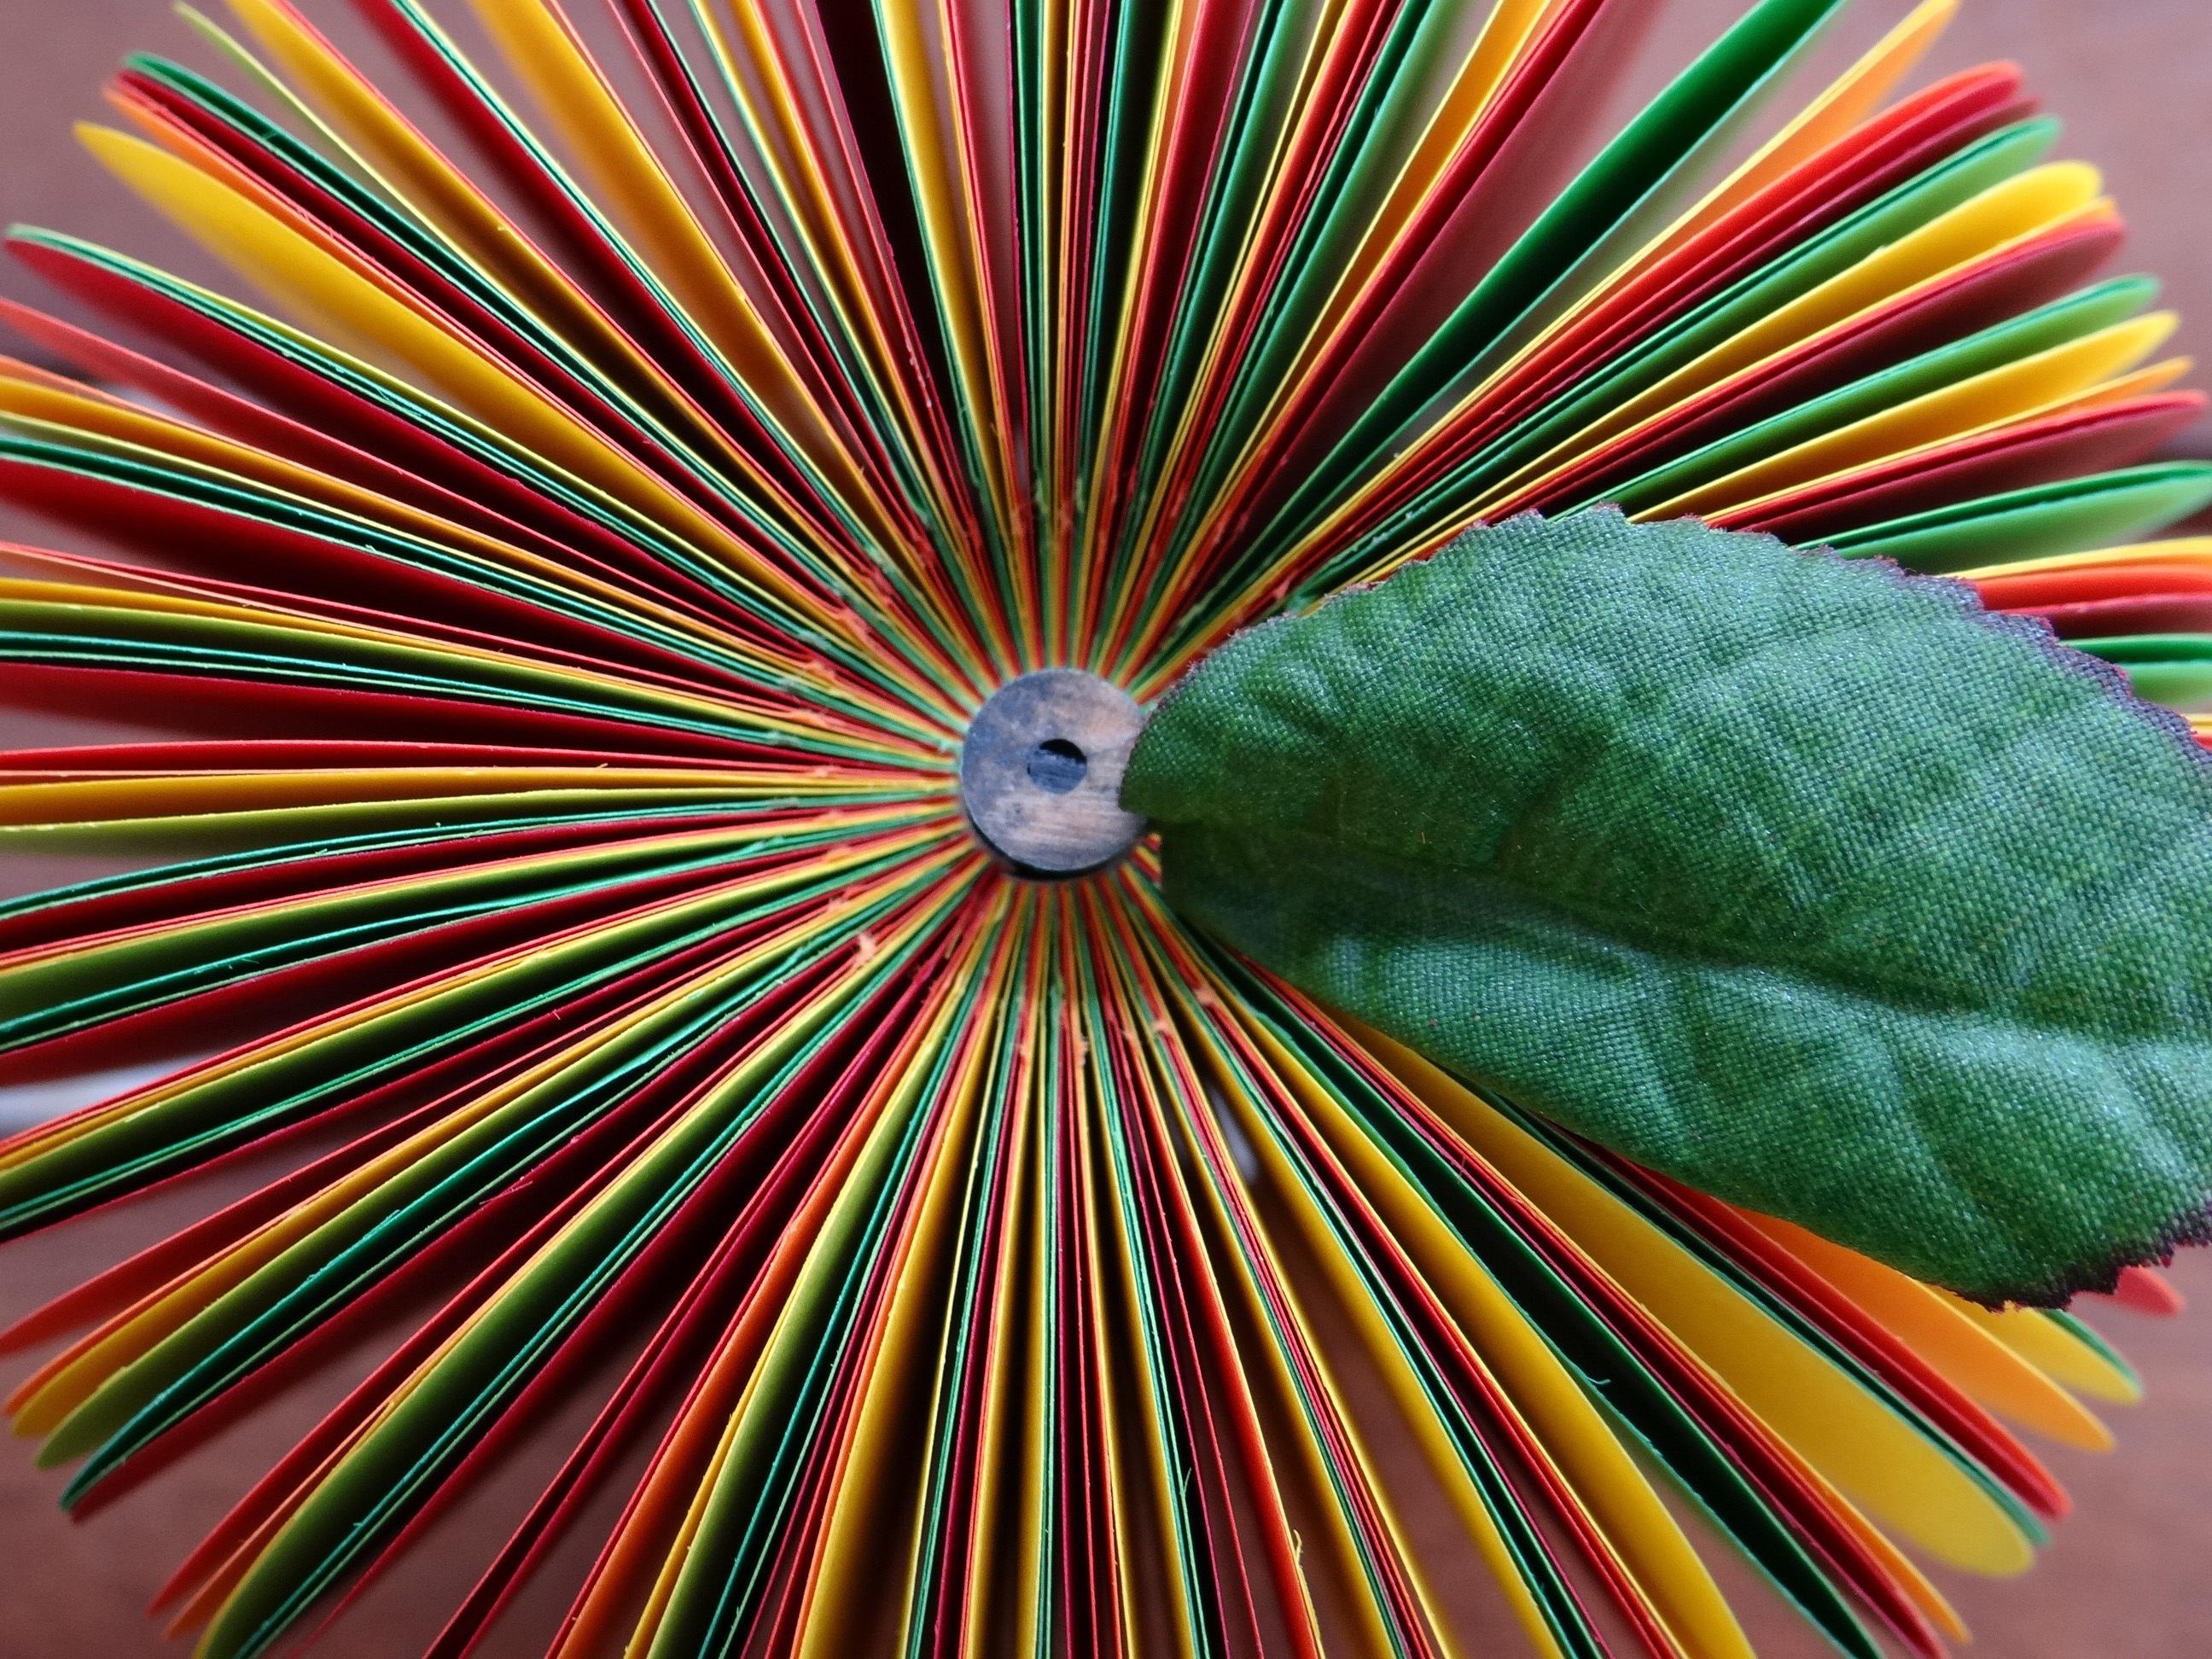 100 Gambar Abstrak Apel Paling Bagus